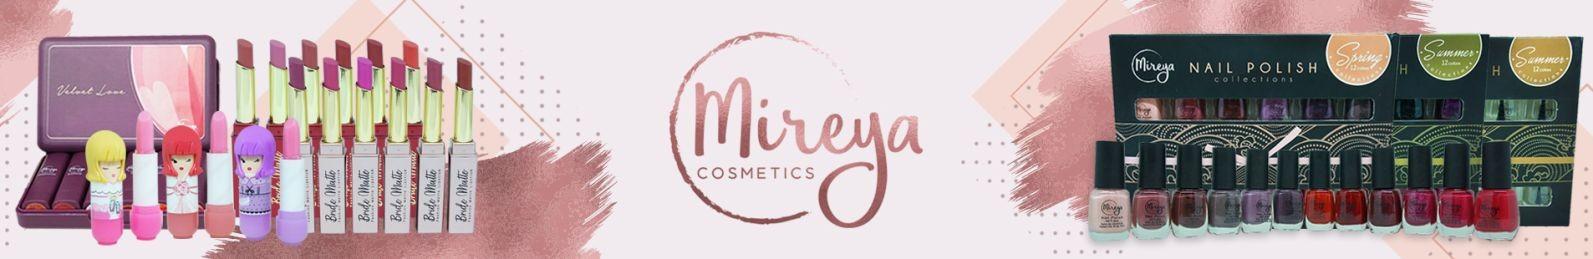 Mireya Cosmetics